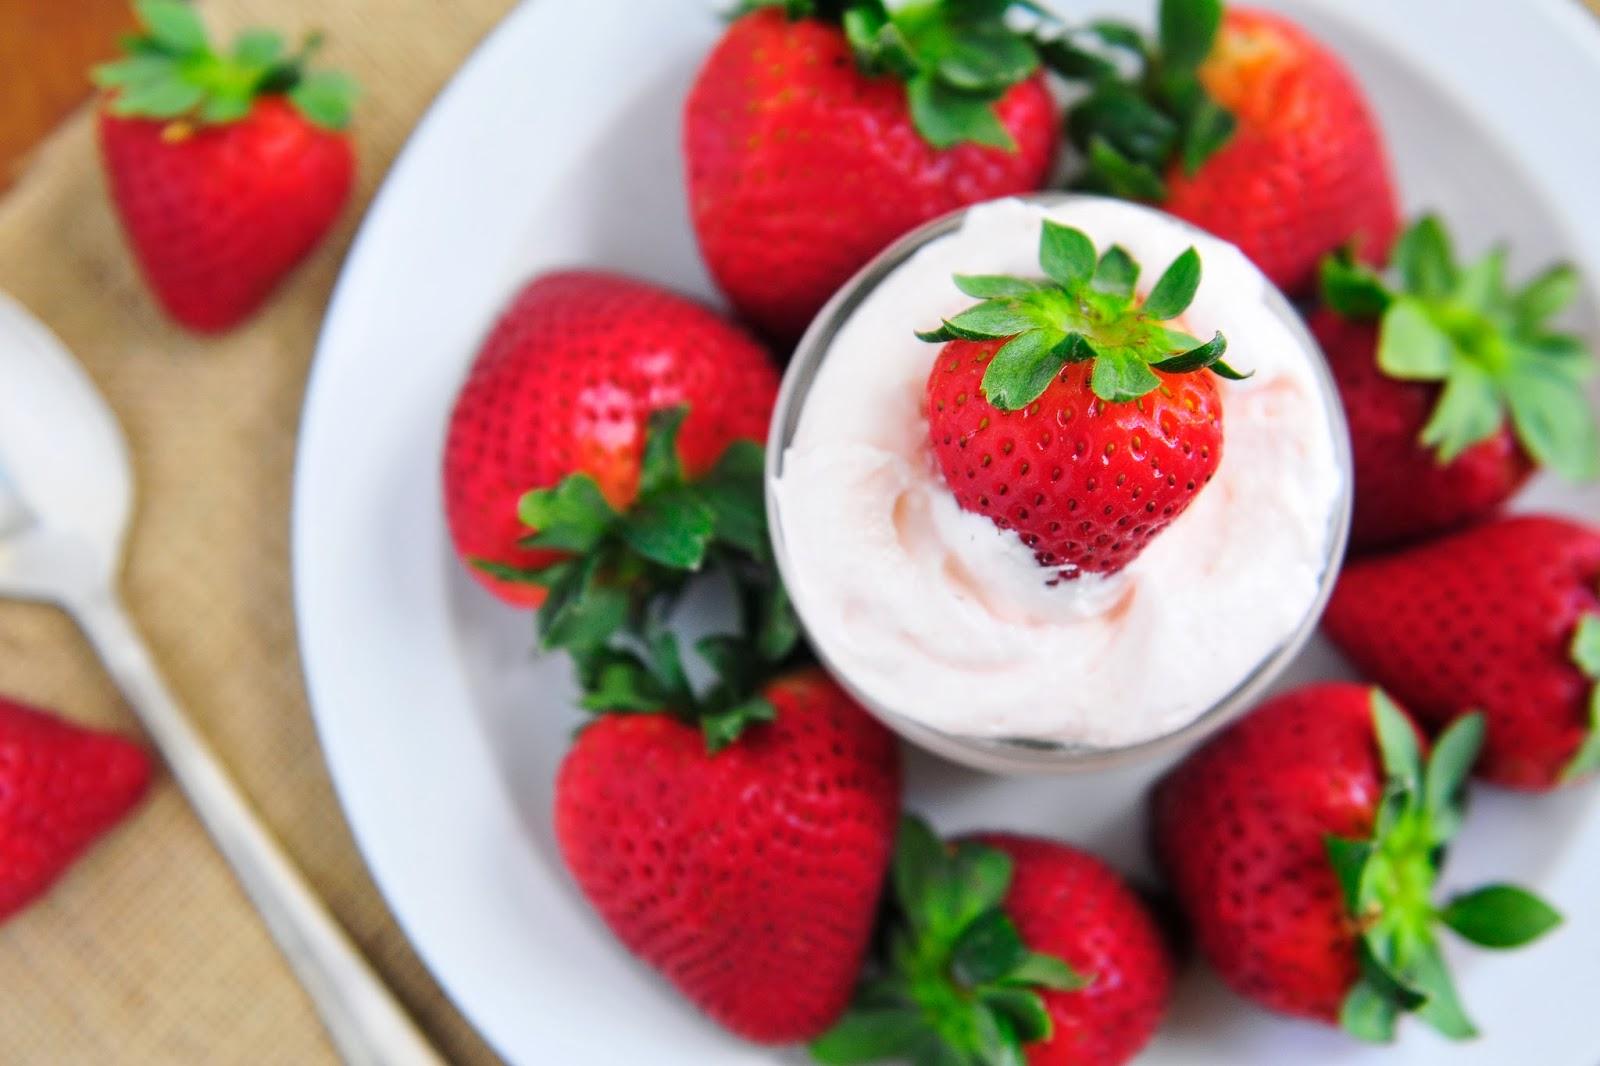 Simply Gourmet: Homemade Marshmallow Fluff and Fruit Dip